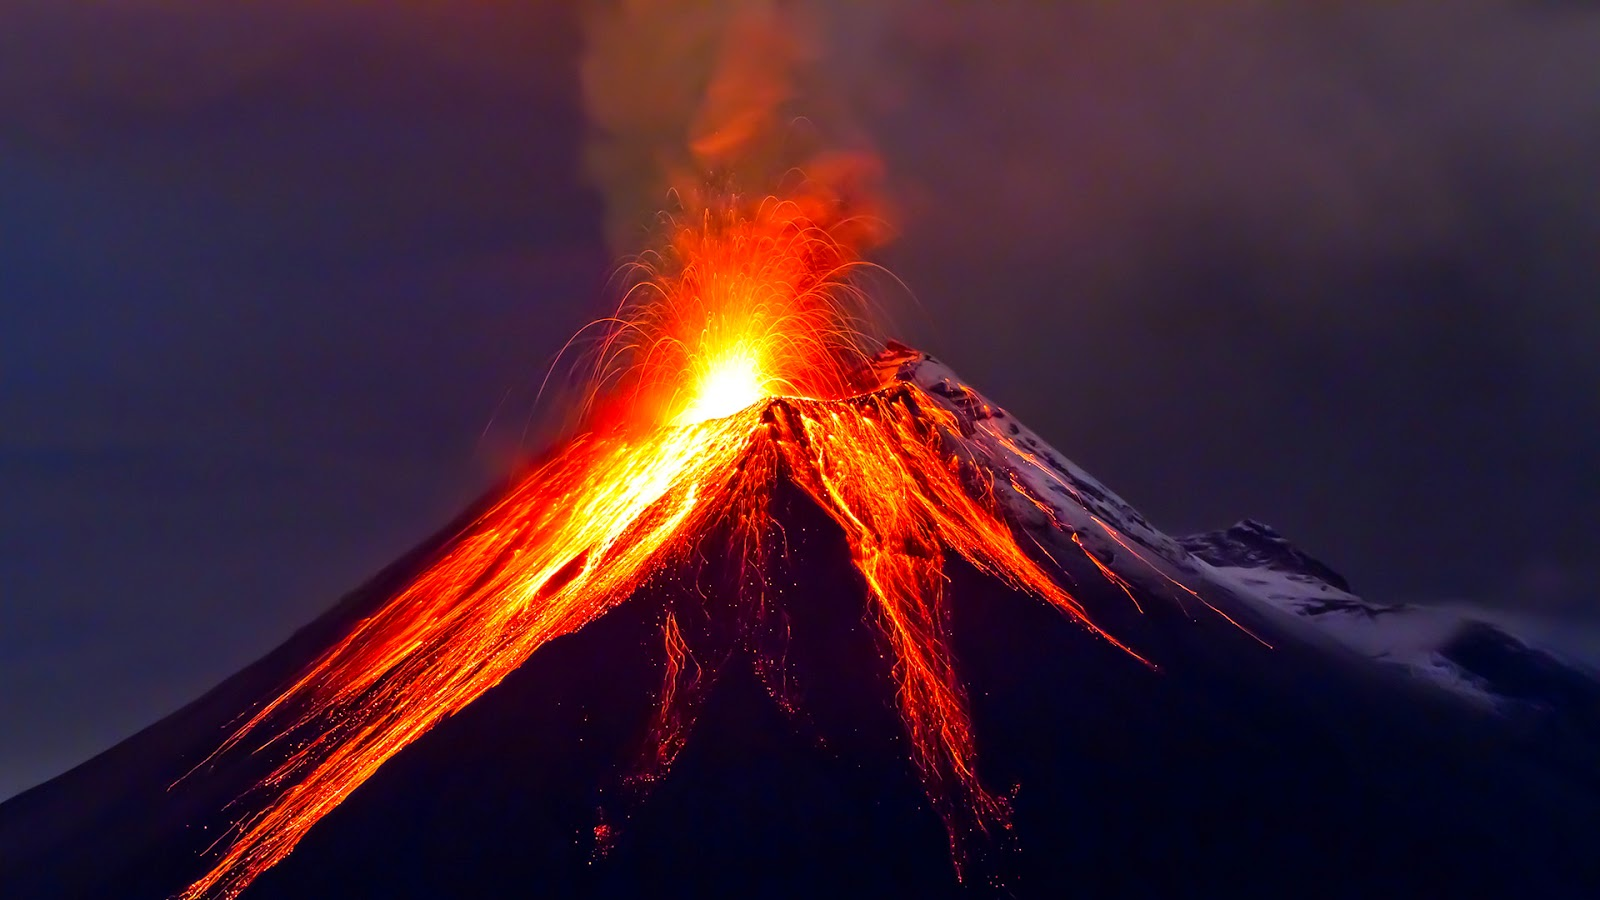 An Erupting volcano Image courtesy: www.fastcoexist.com